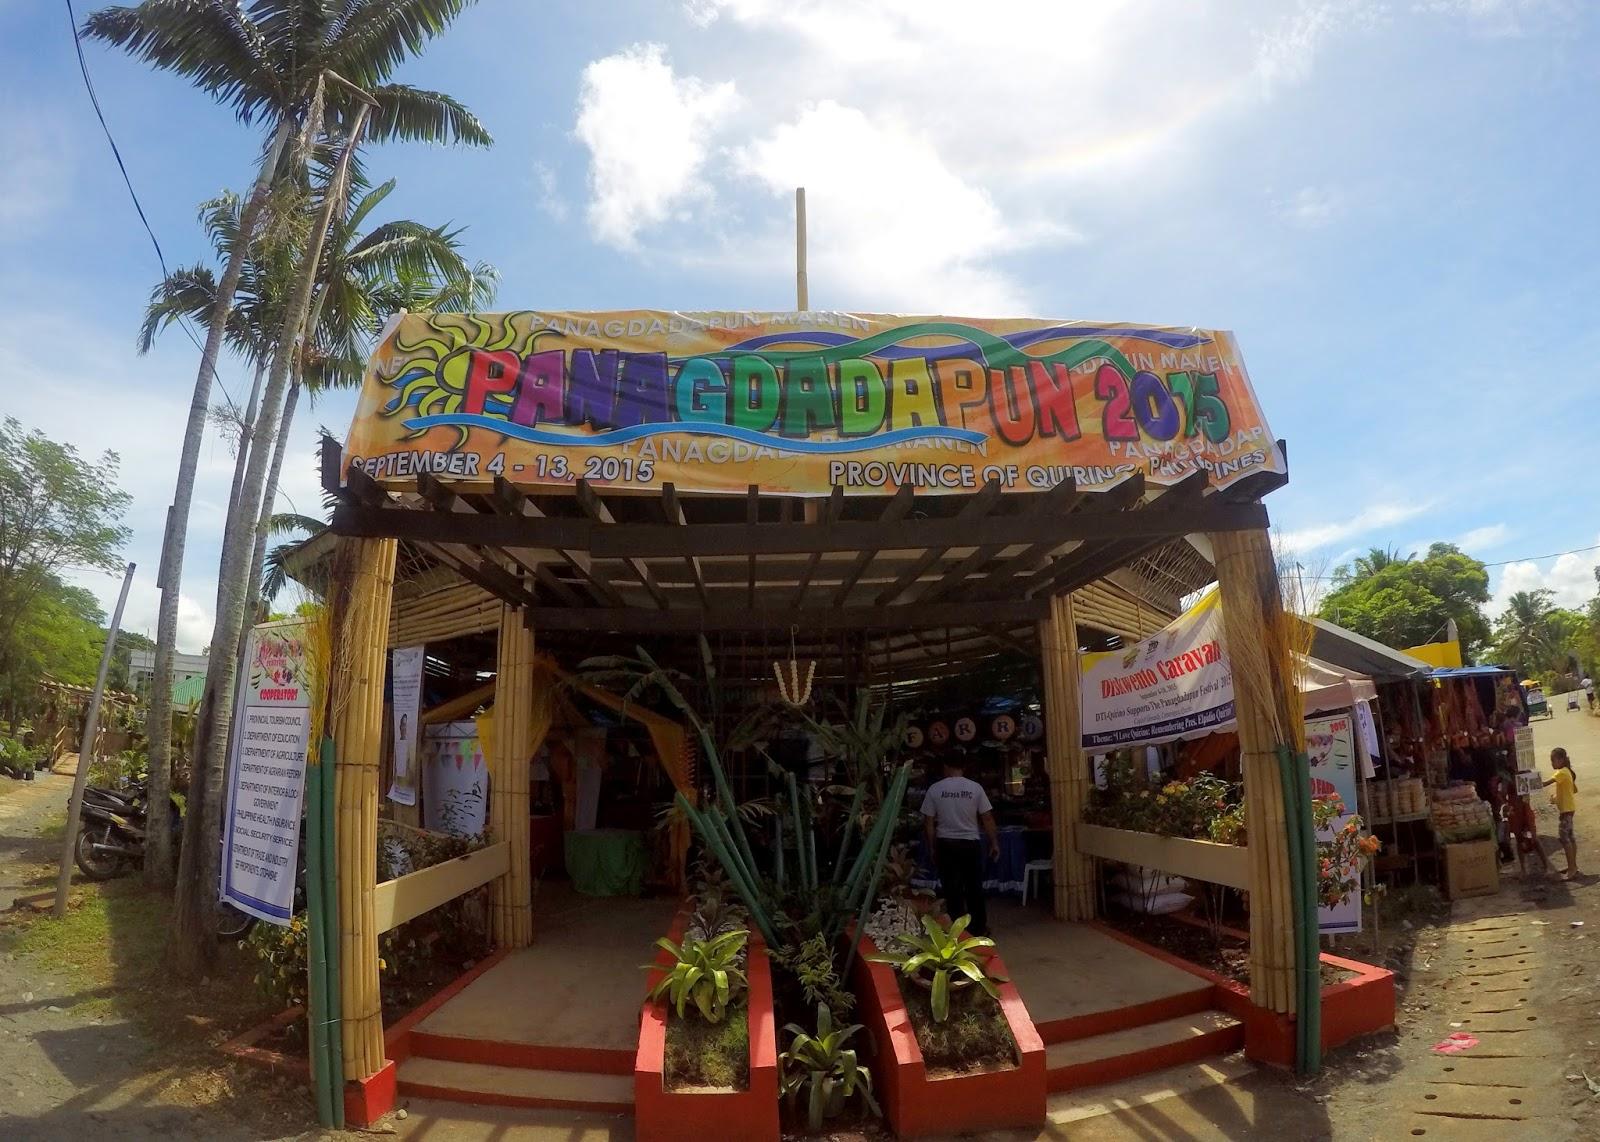 Pinagdadapun Festival 2015